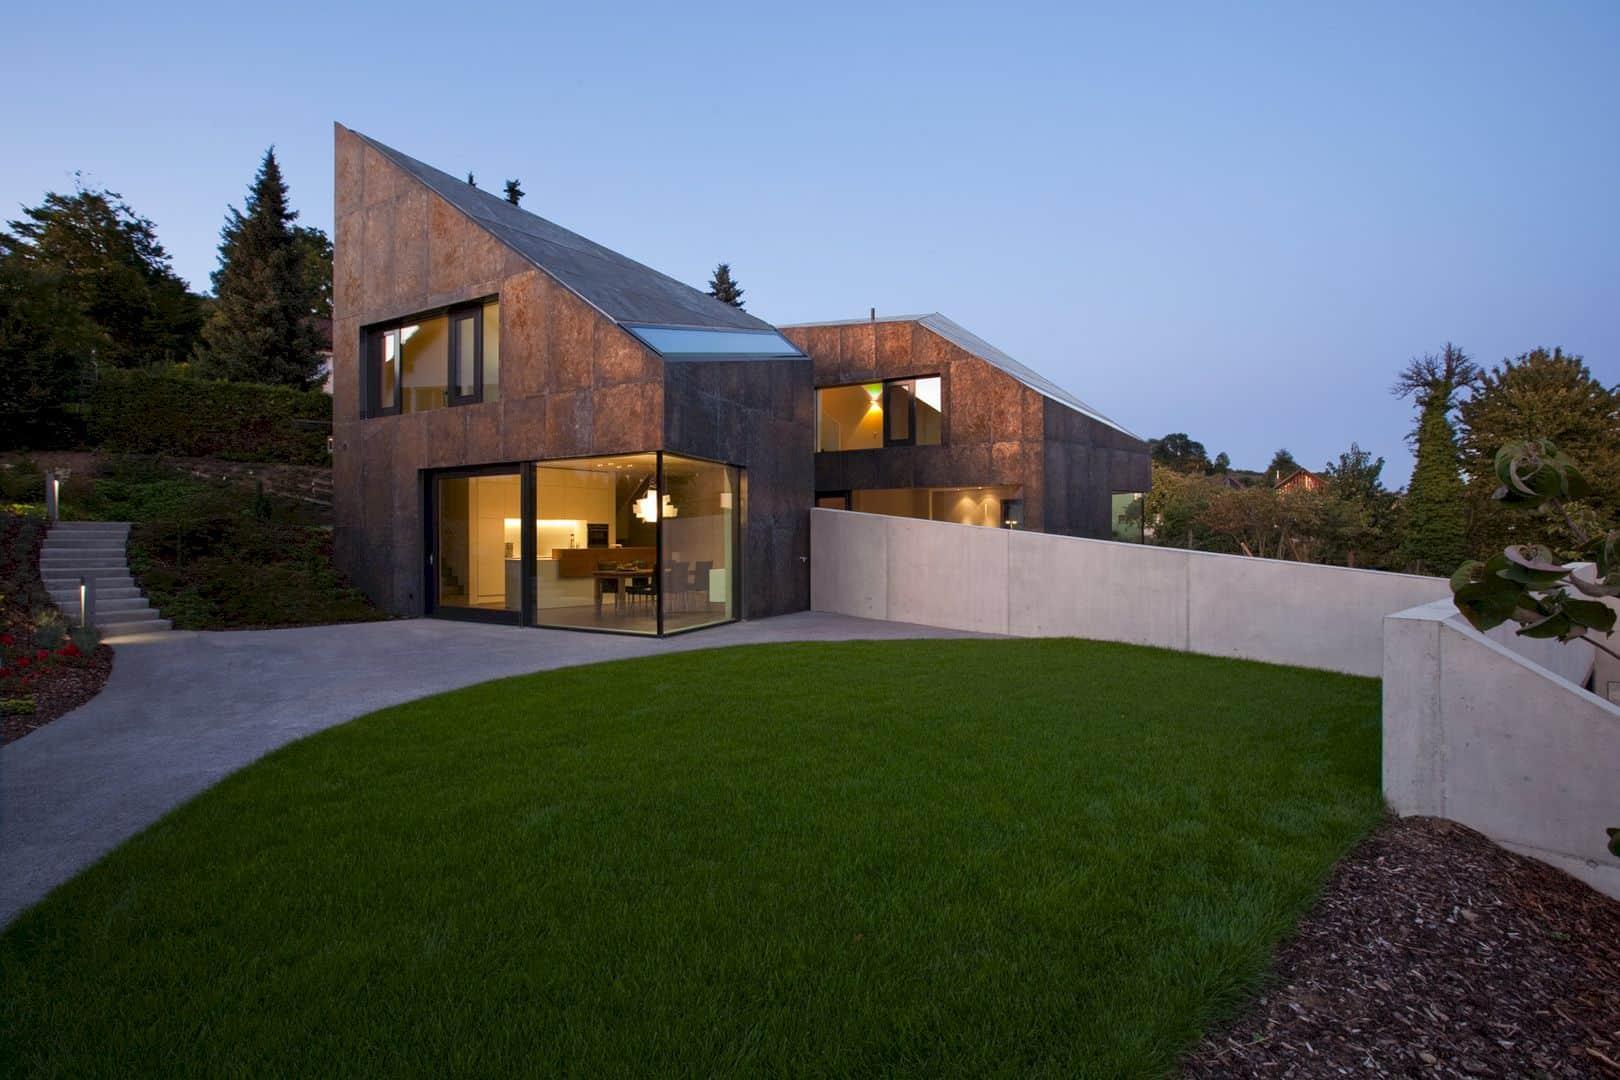 2 EFH Wingert Oberweningen By L3P Architekten 22